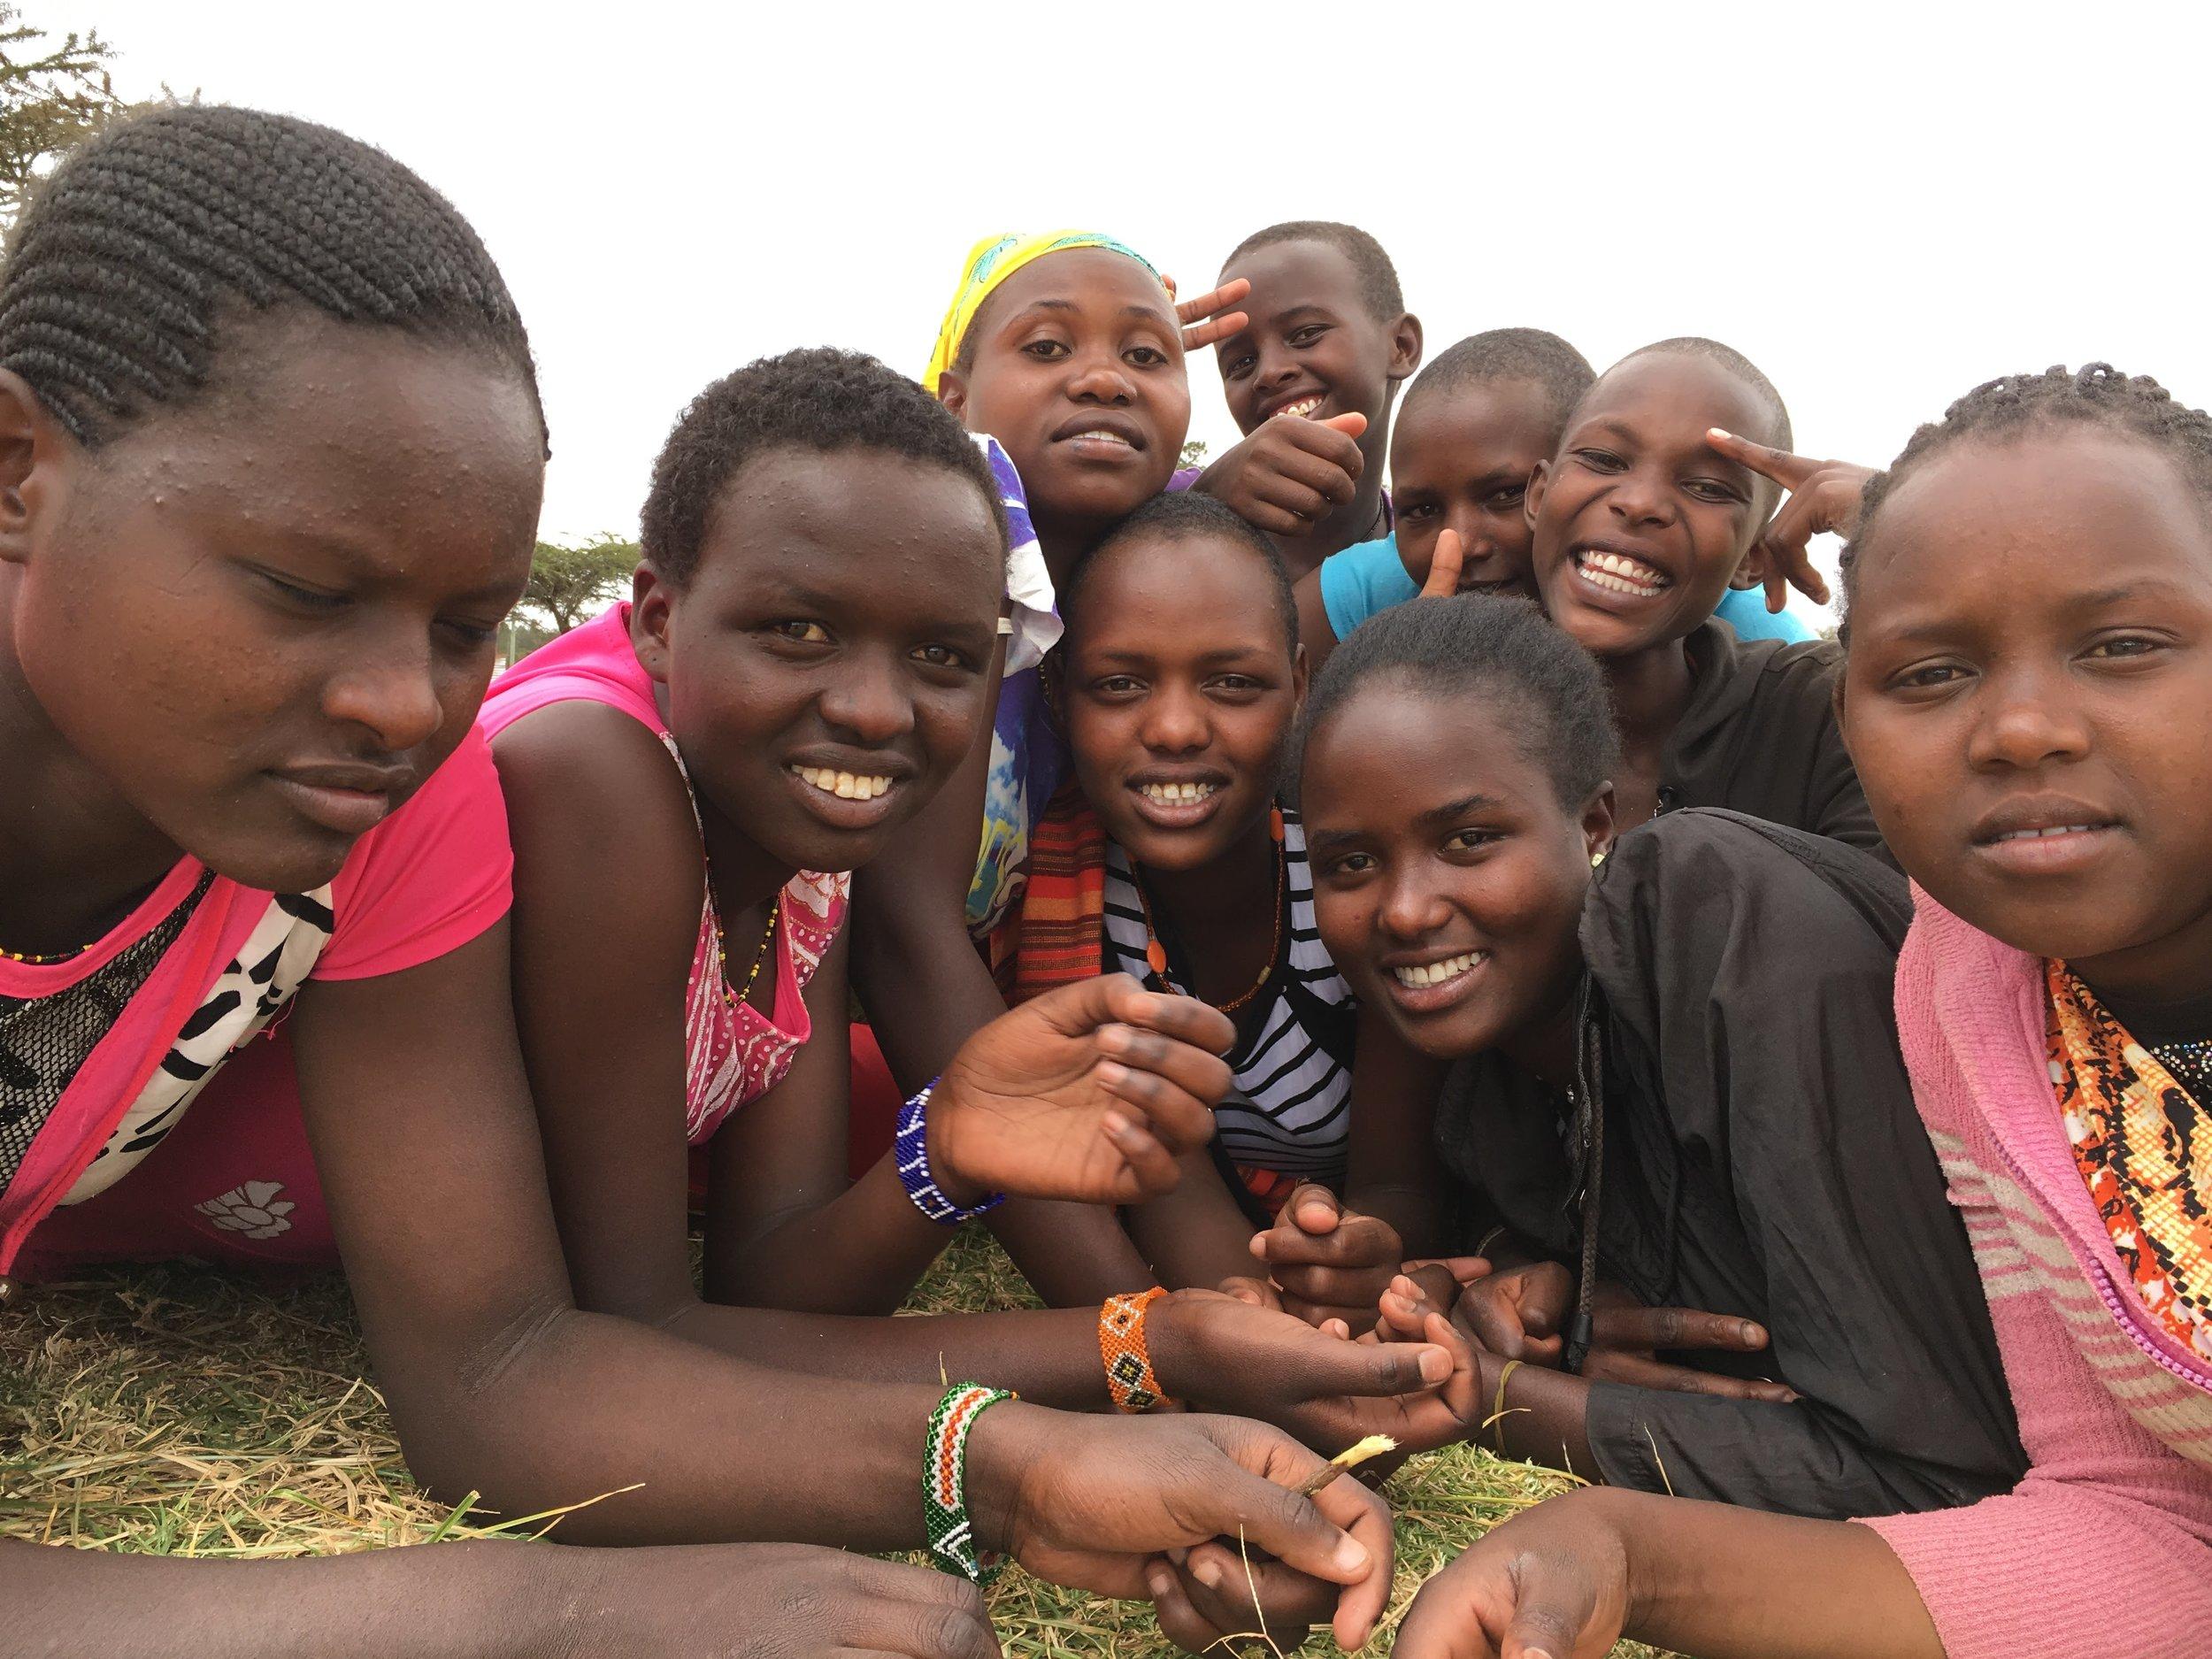 Samburu Girls Foundation  Photo via: Lesley Saeger